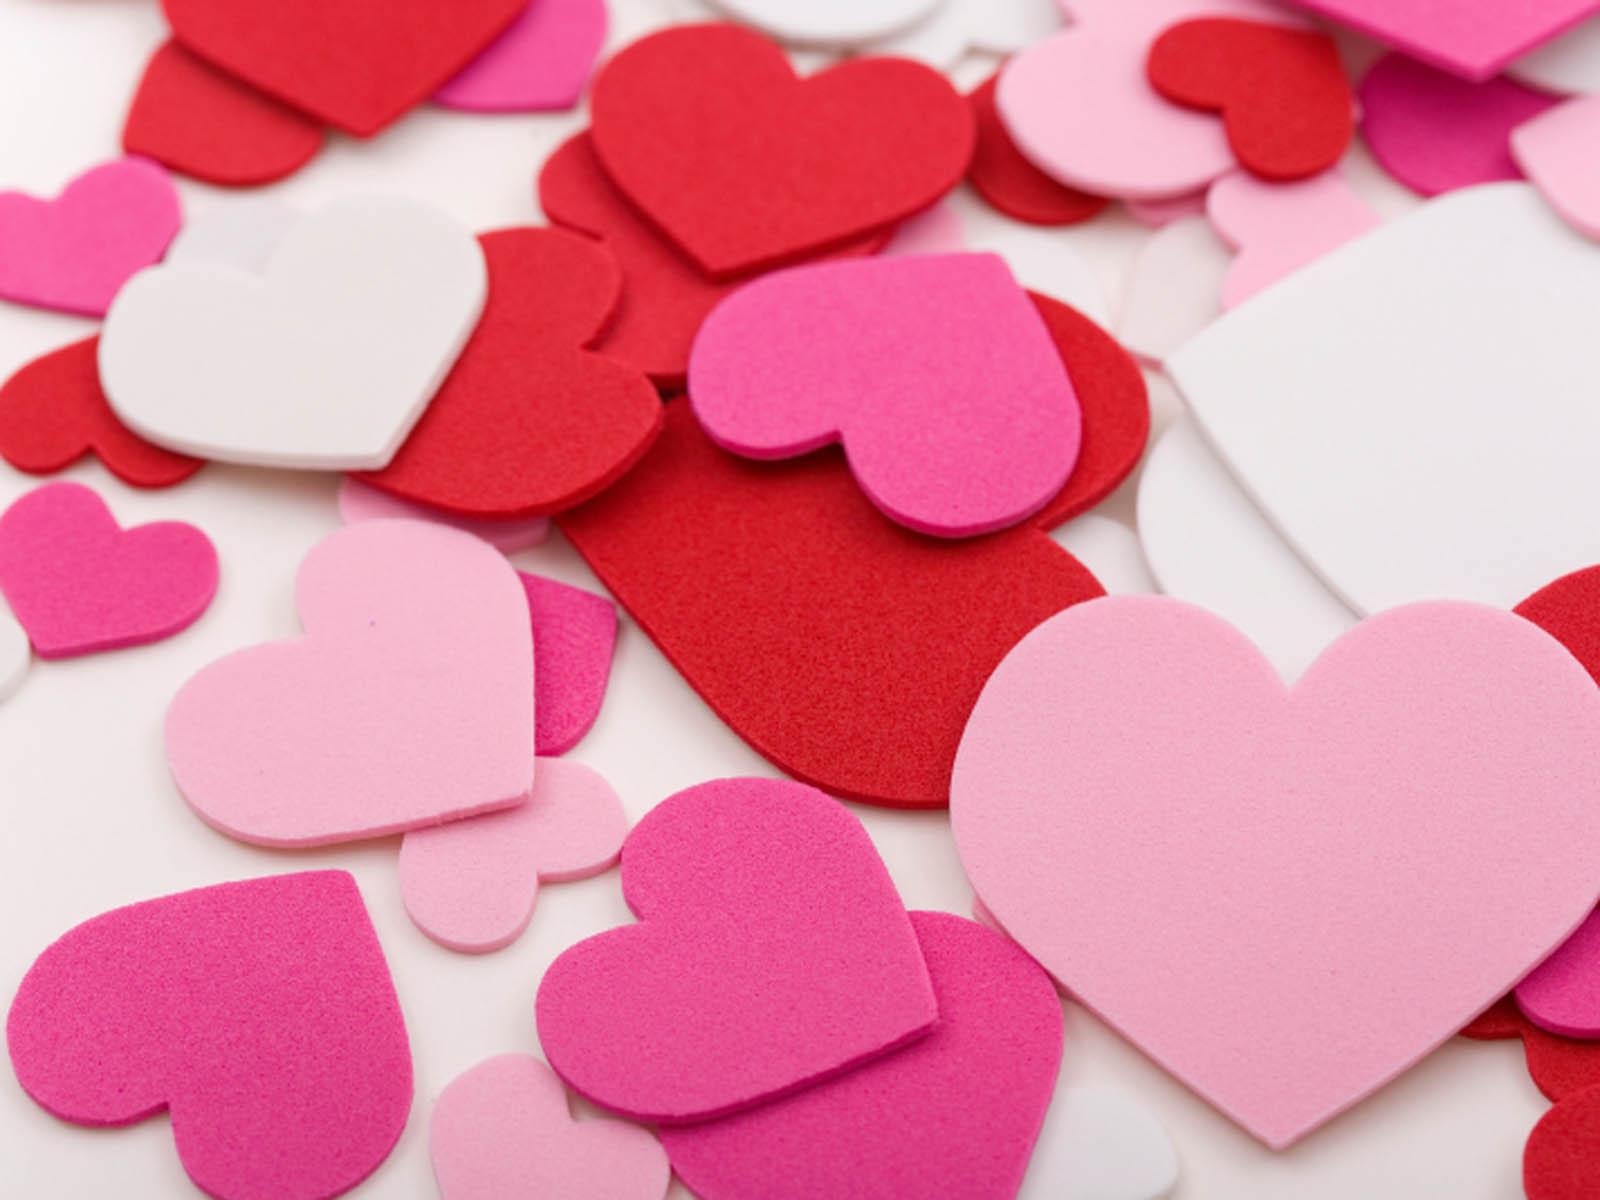 Heart Love Wallpapers Best Wallpaper